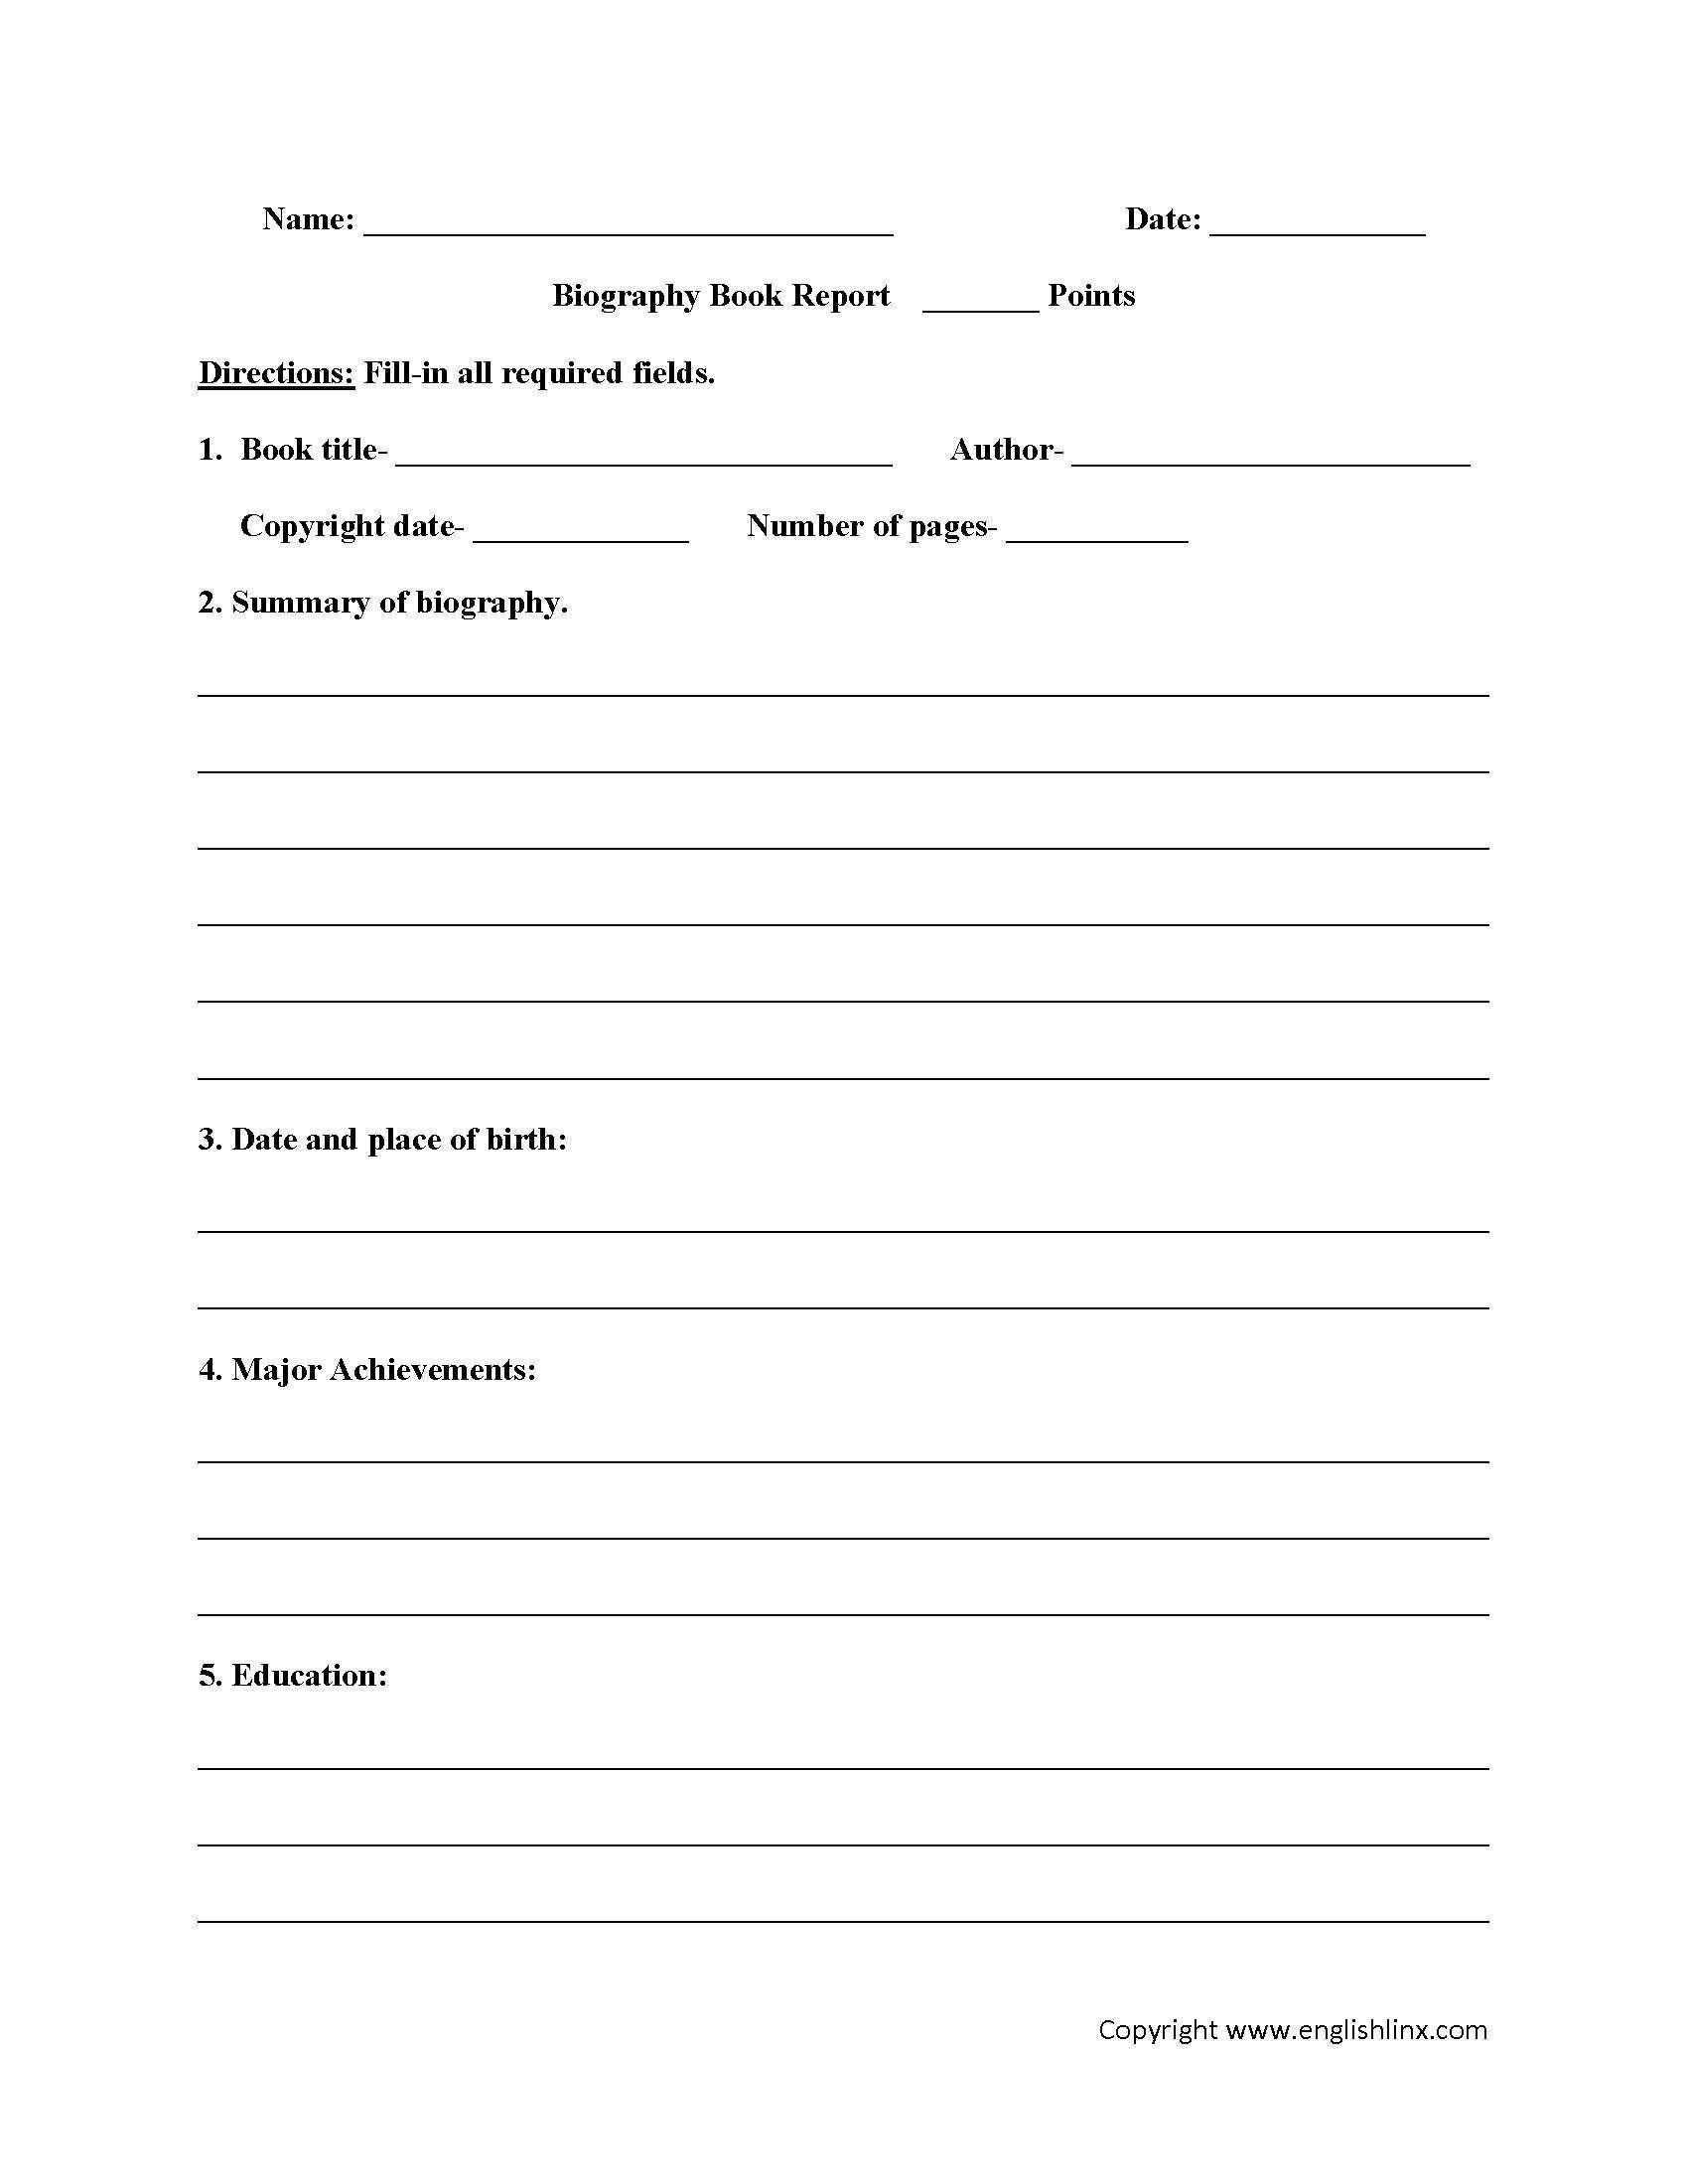 Abeka 5th Grade Math Worksheets First Grade Abeka Worksheets In 2020 Book Report Templates Biography Book Report Template Biography Book Report